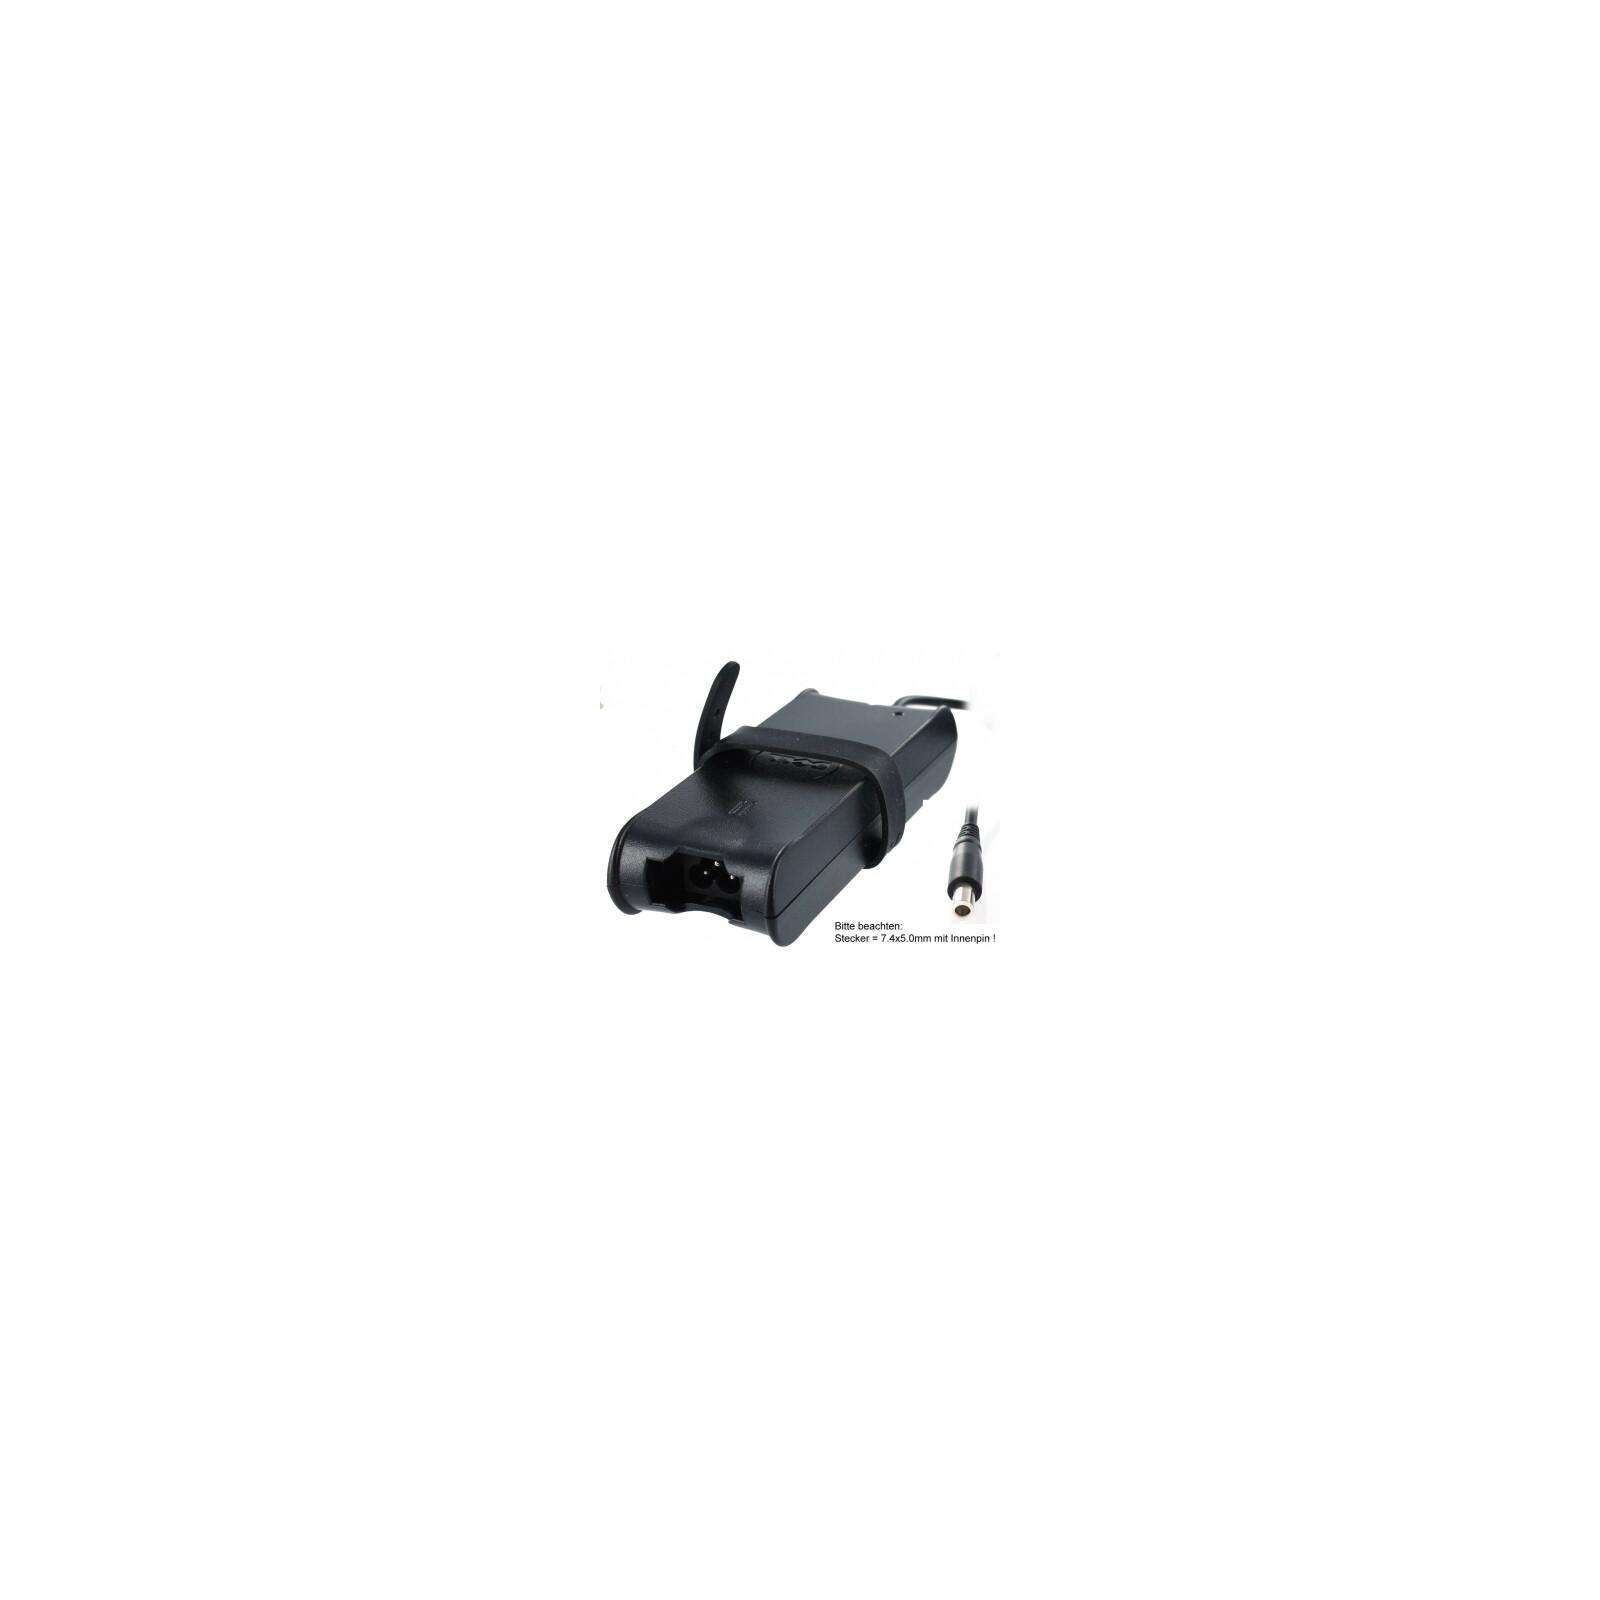 Dell 10326 Original Netzteil Inspiron 8600